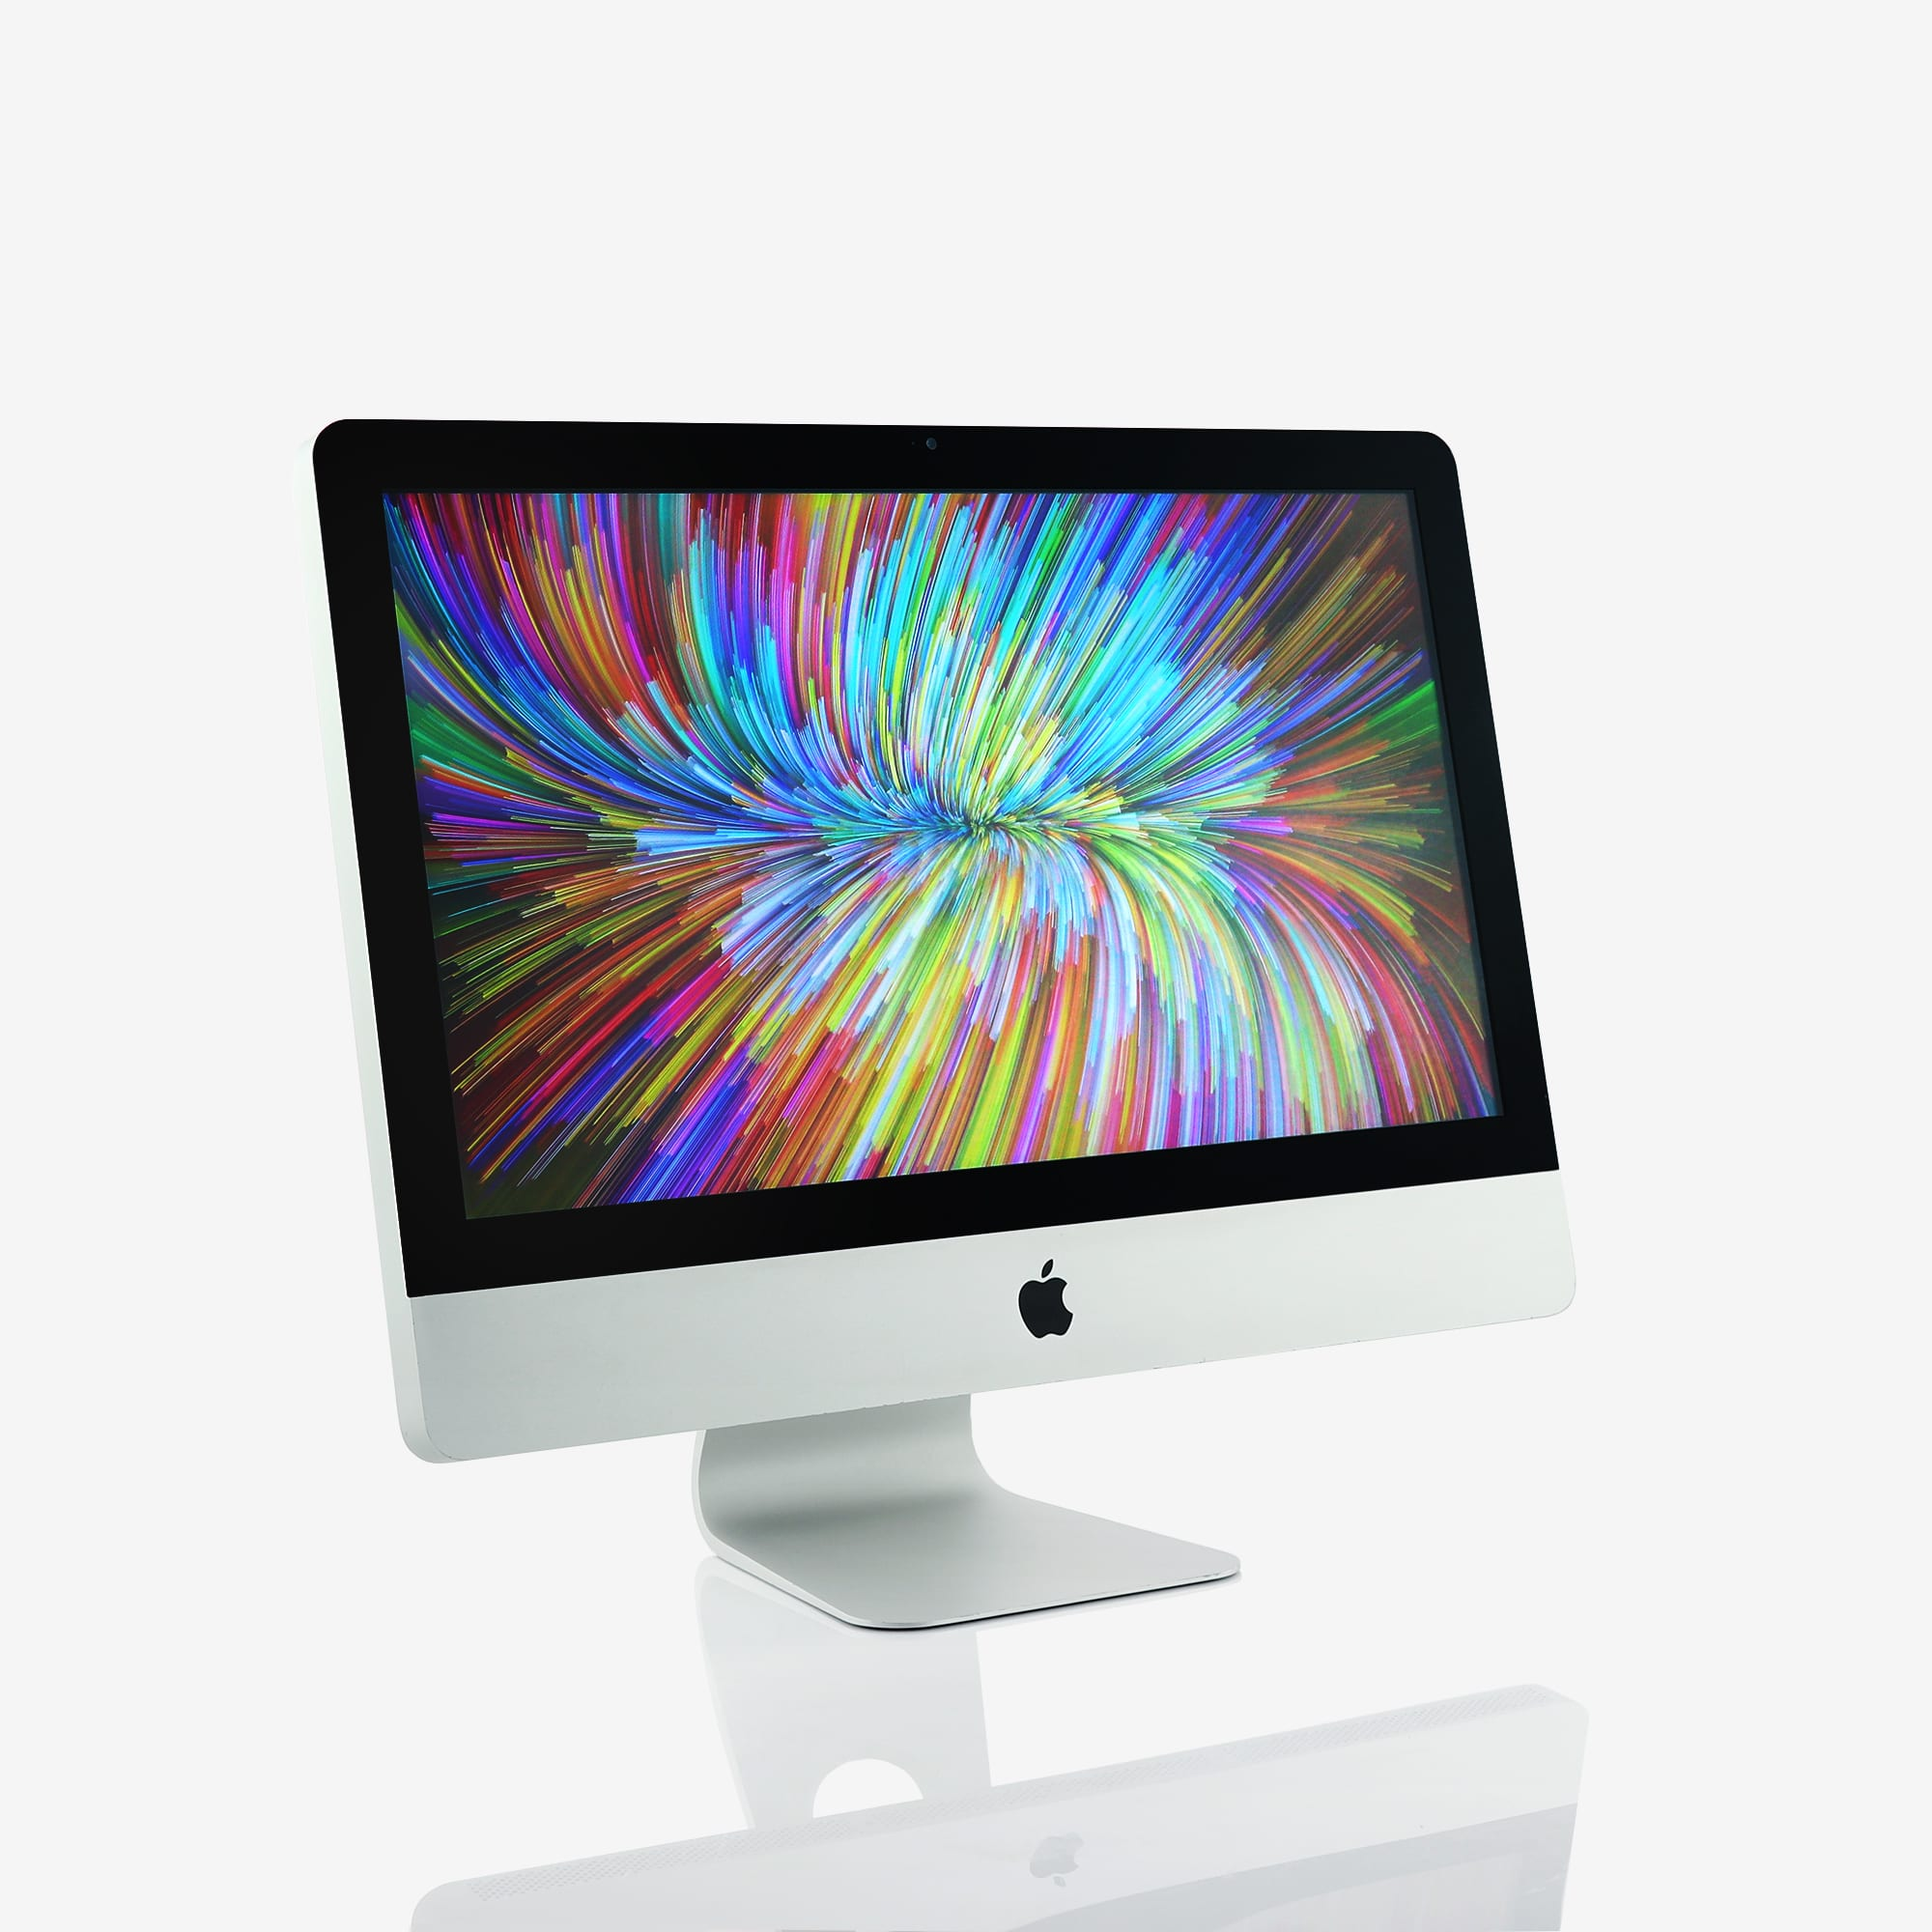 1 x Apple iMac 21.5 Inch Core 2 Duo 3.06 GHz (2009)